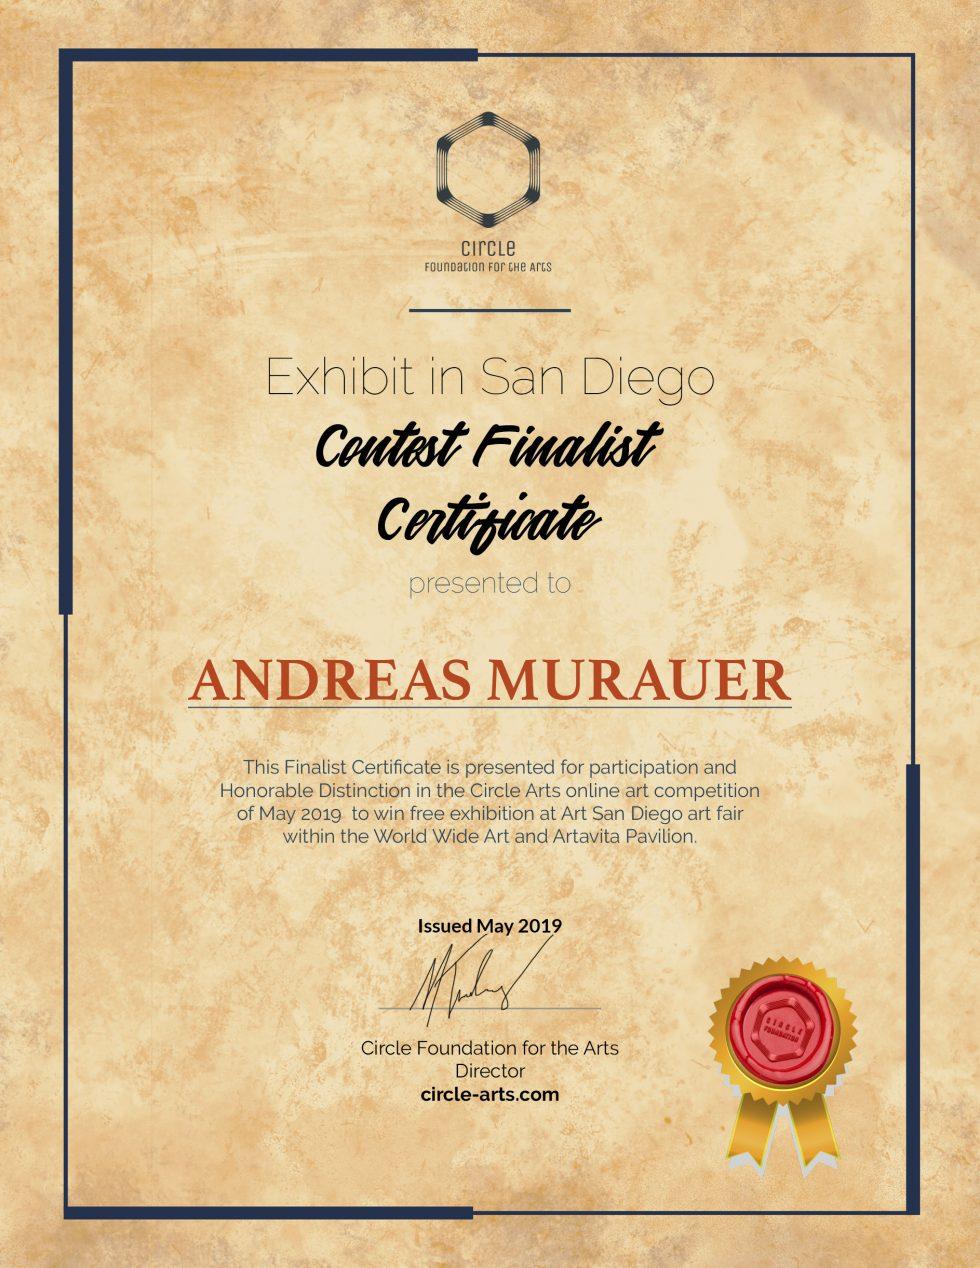 CFA-SanDiegoShow_ContestFinalist_Certificate - Andreas Murauer